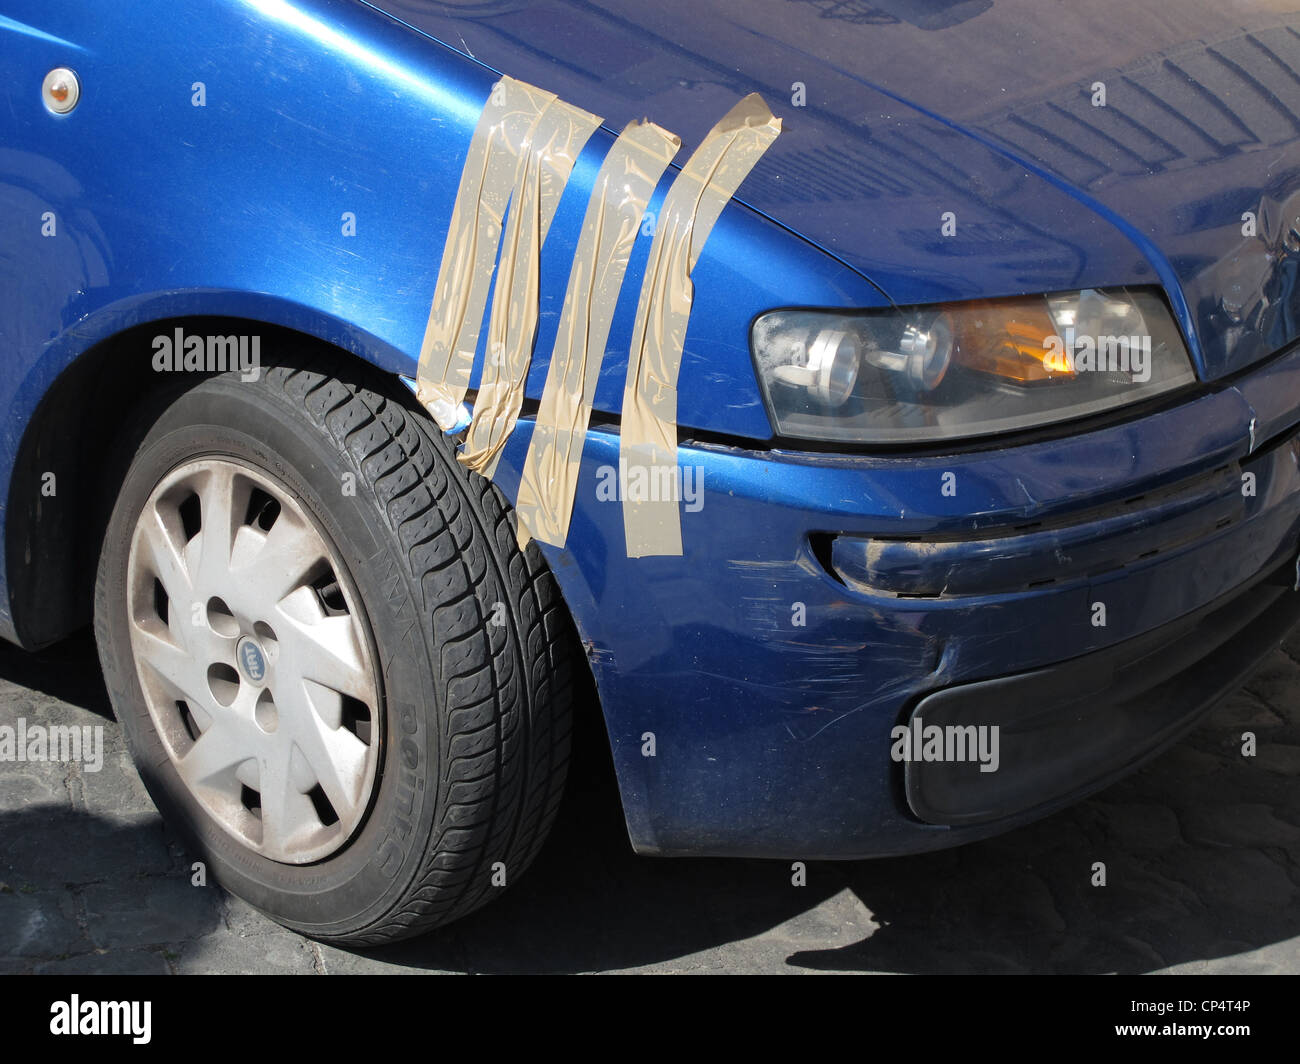 Temporary Repair For Broken Car Front Wing Bumper Stock Photo